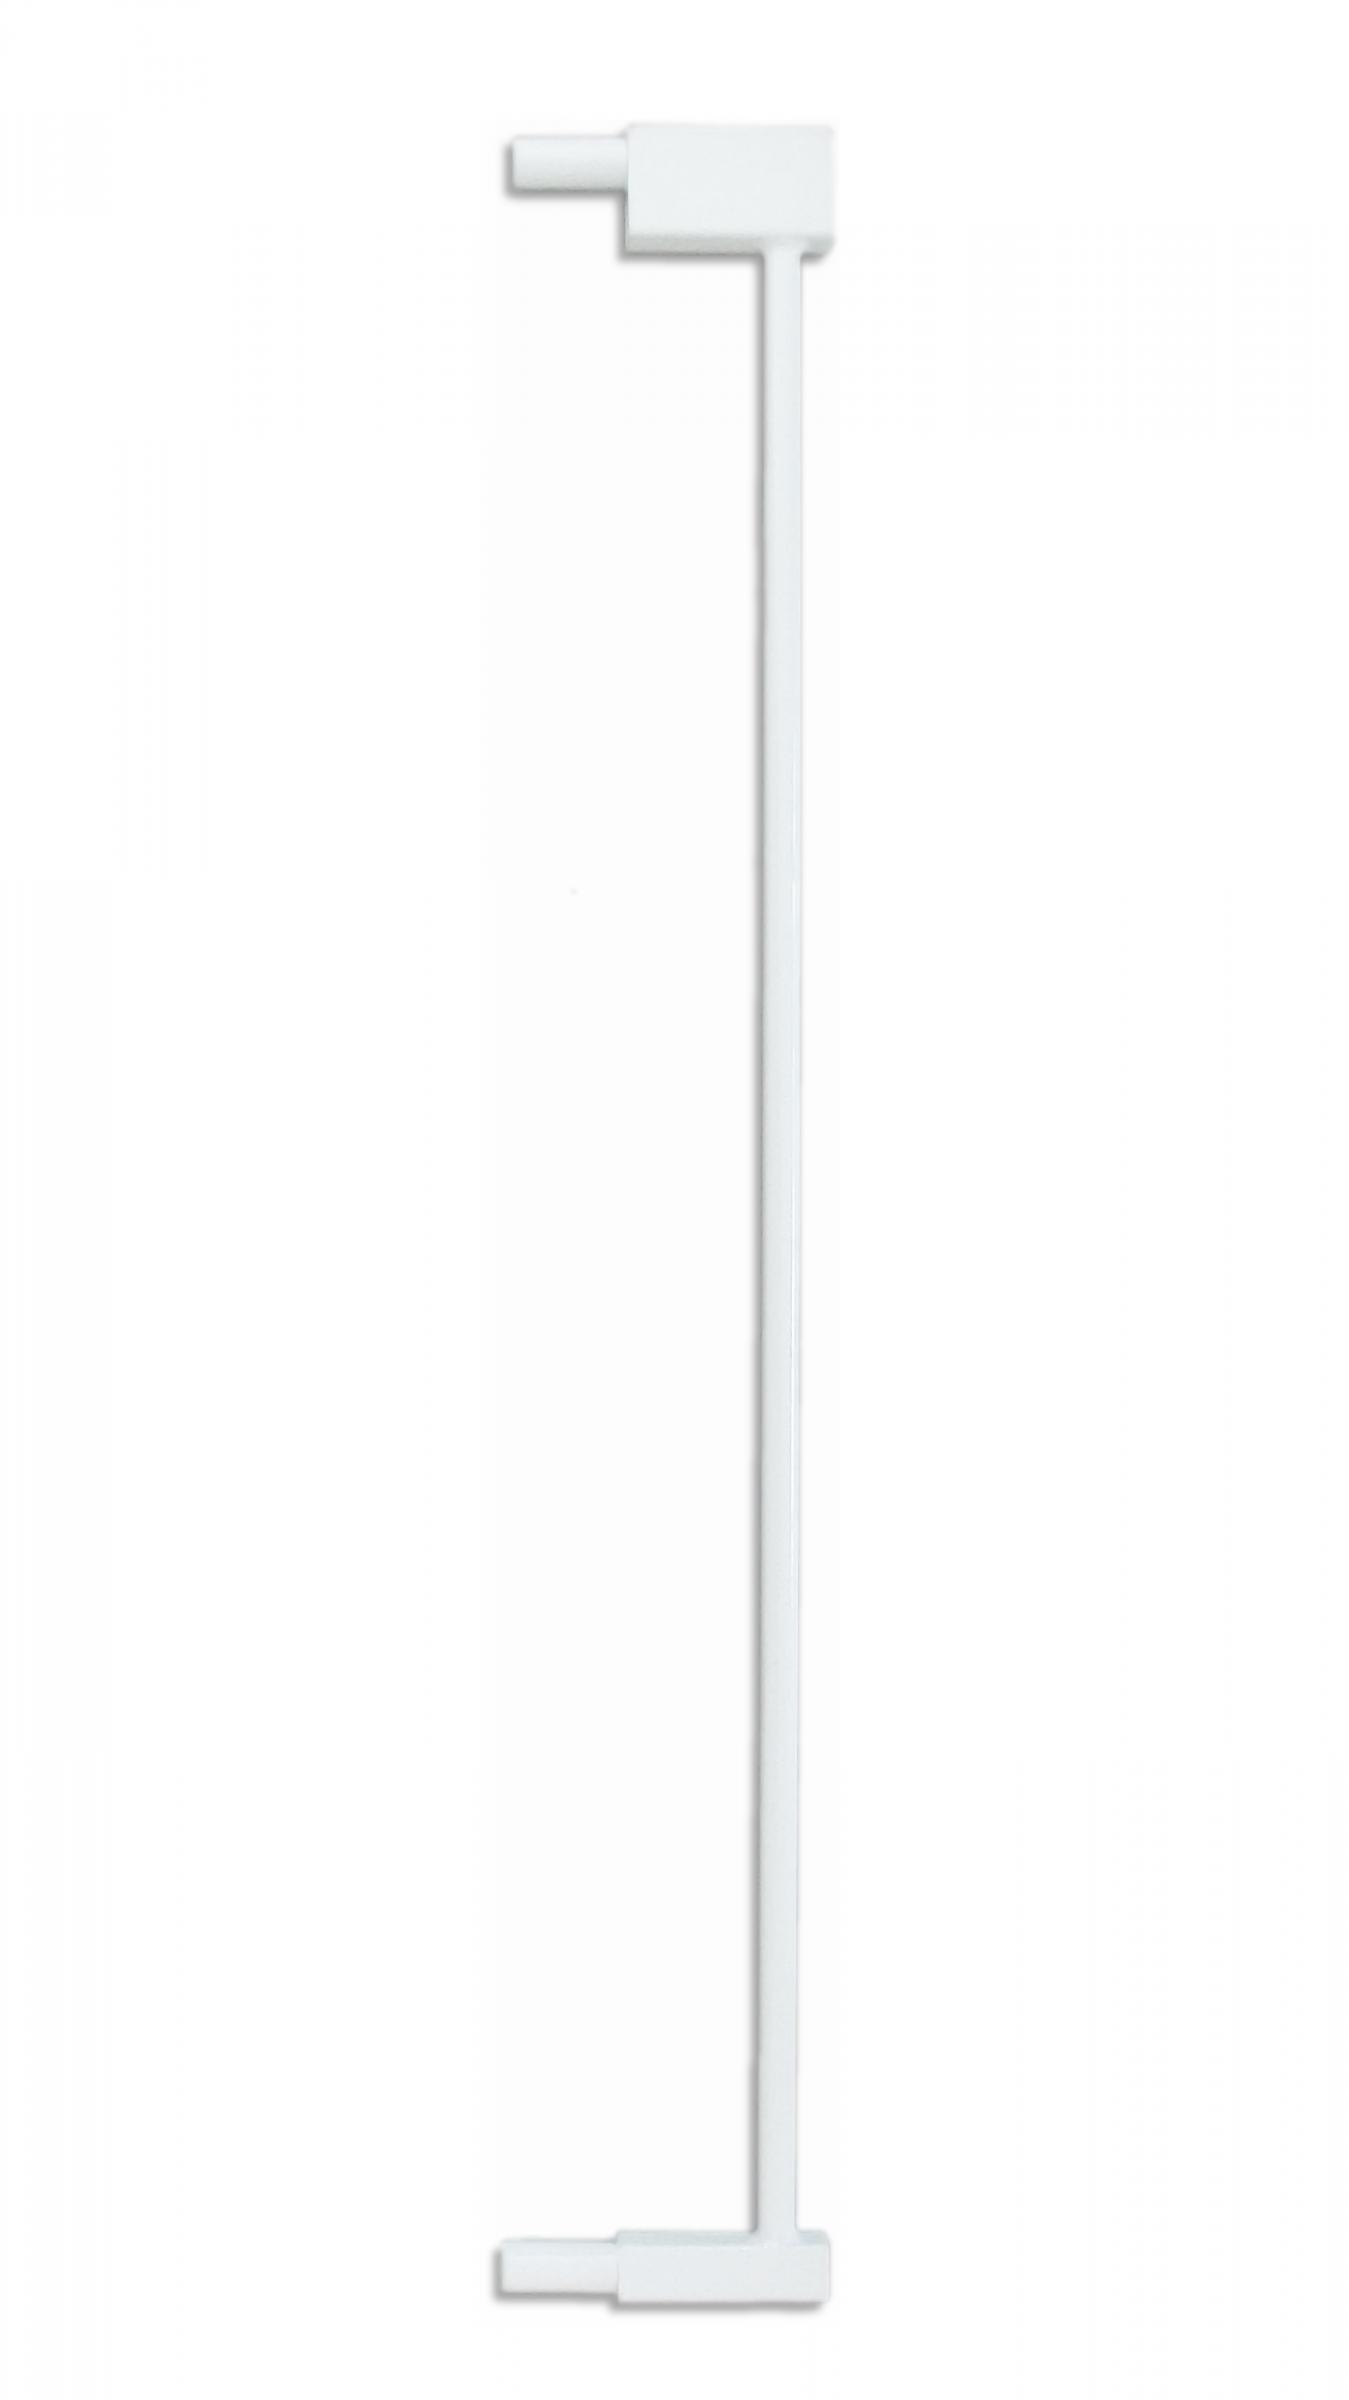 Fillikid Verlängerung 72mm zu TG 44240